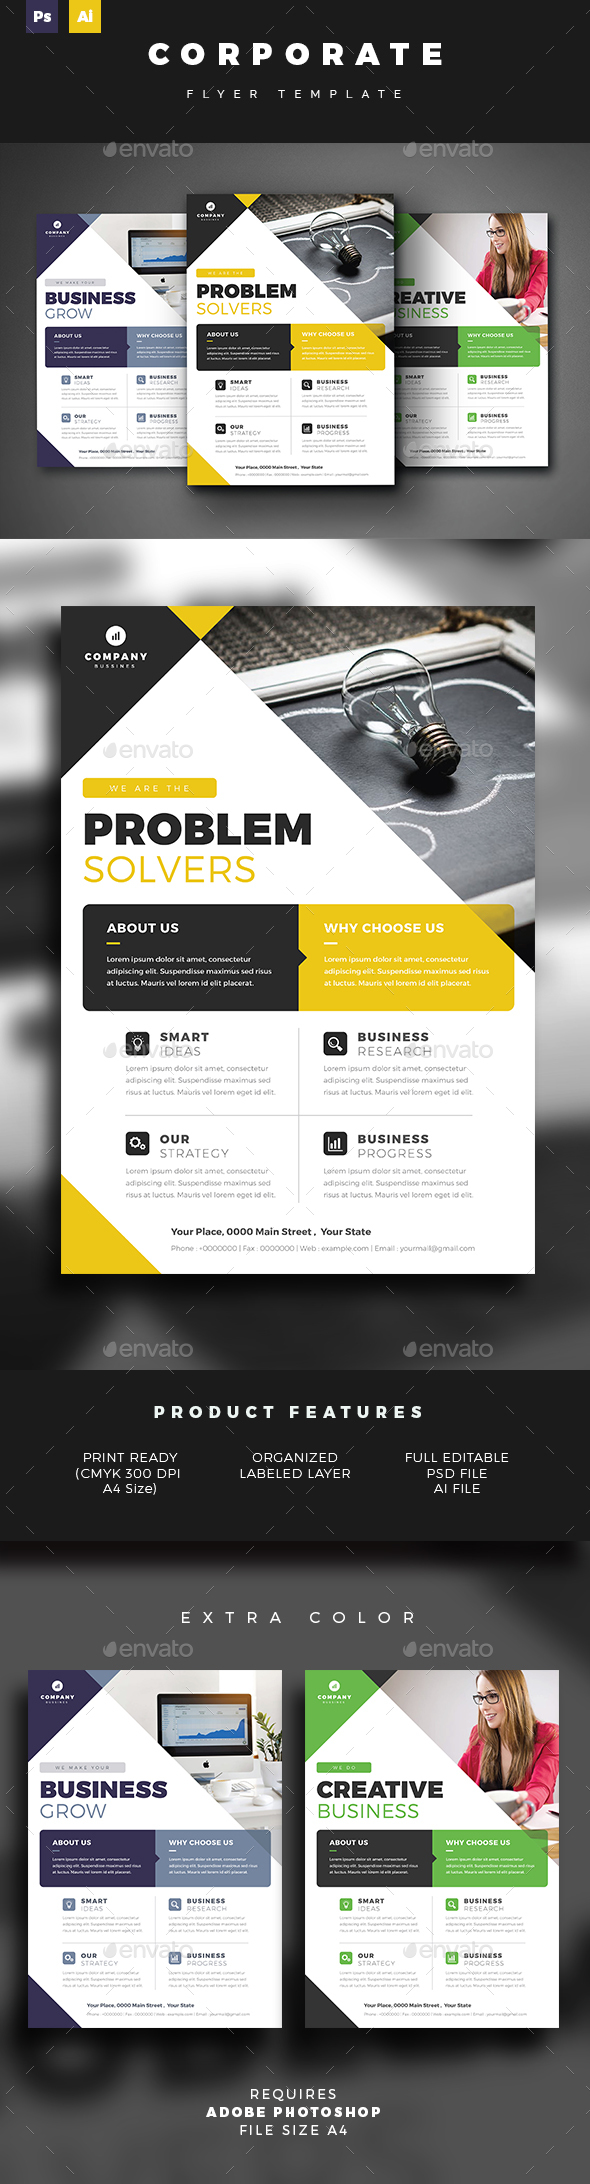 GraphicRiver Corporate Flyer Template 21094171